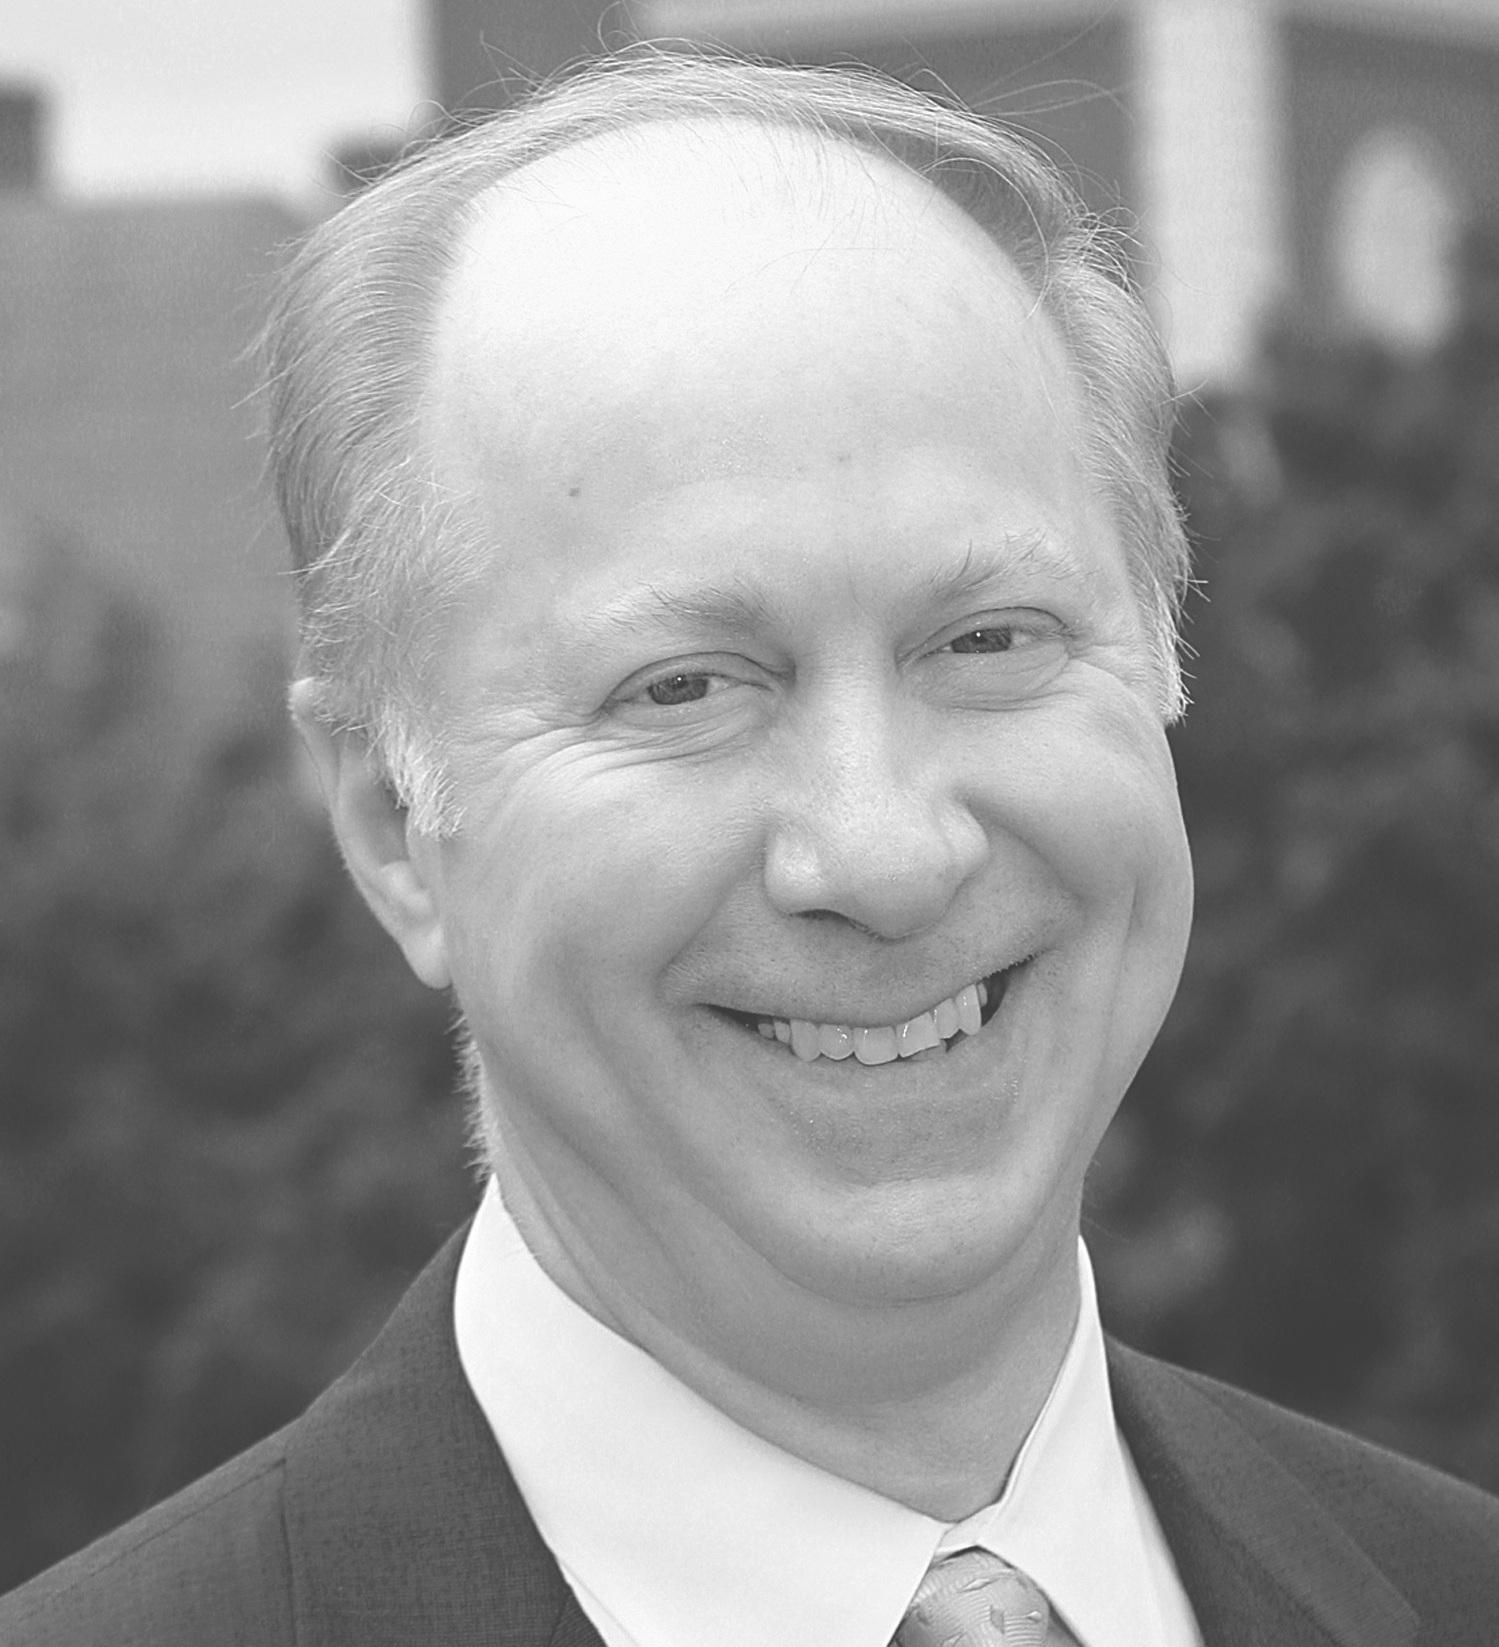 DAVID GERGEN | PROFESSOR OF PUBLIC SERVICE, HARVARD KENNEDY SCHOOL